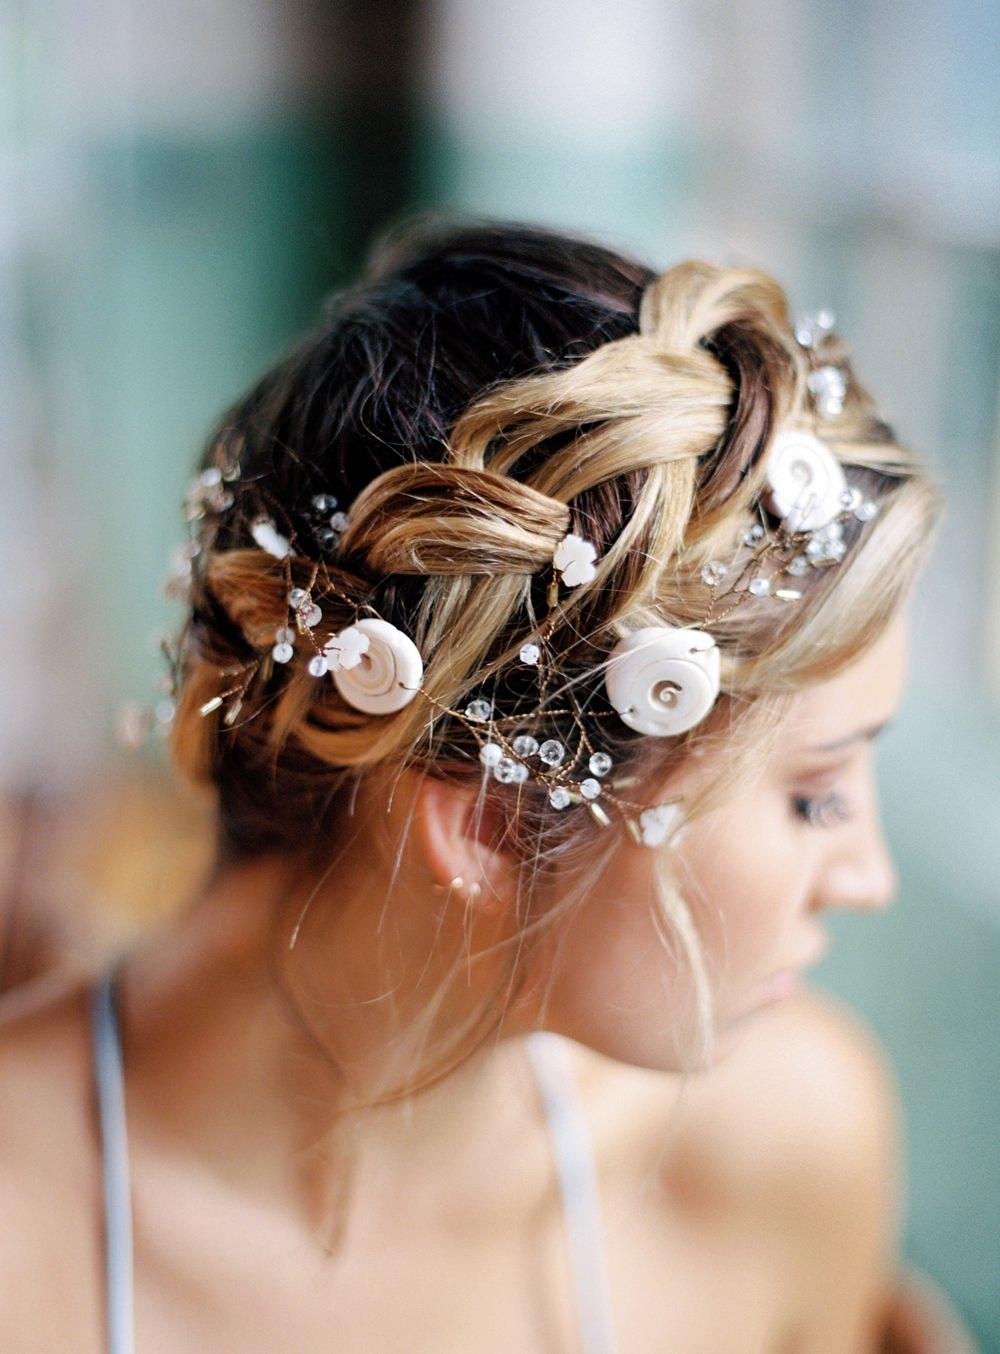 Nature Inspired Styled Shoot Seashell Headpiece Braided Updo Bride Blue Dress   Ocean Wedding Ideas Industrial Rachel Watkinson Photography